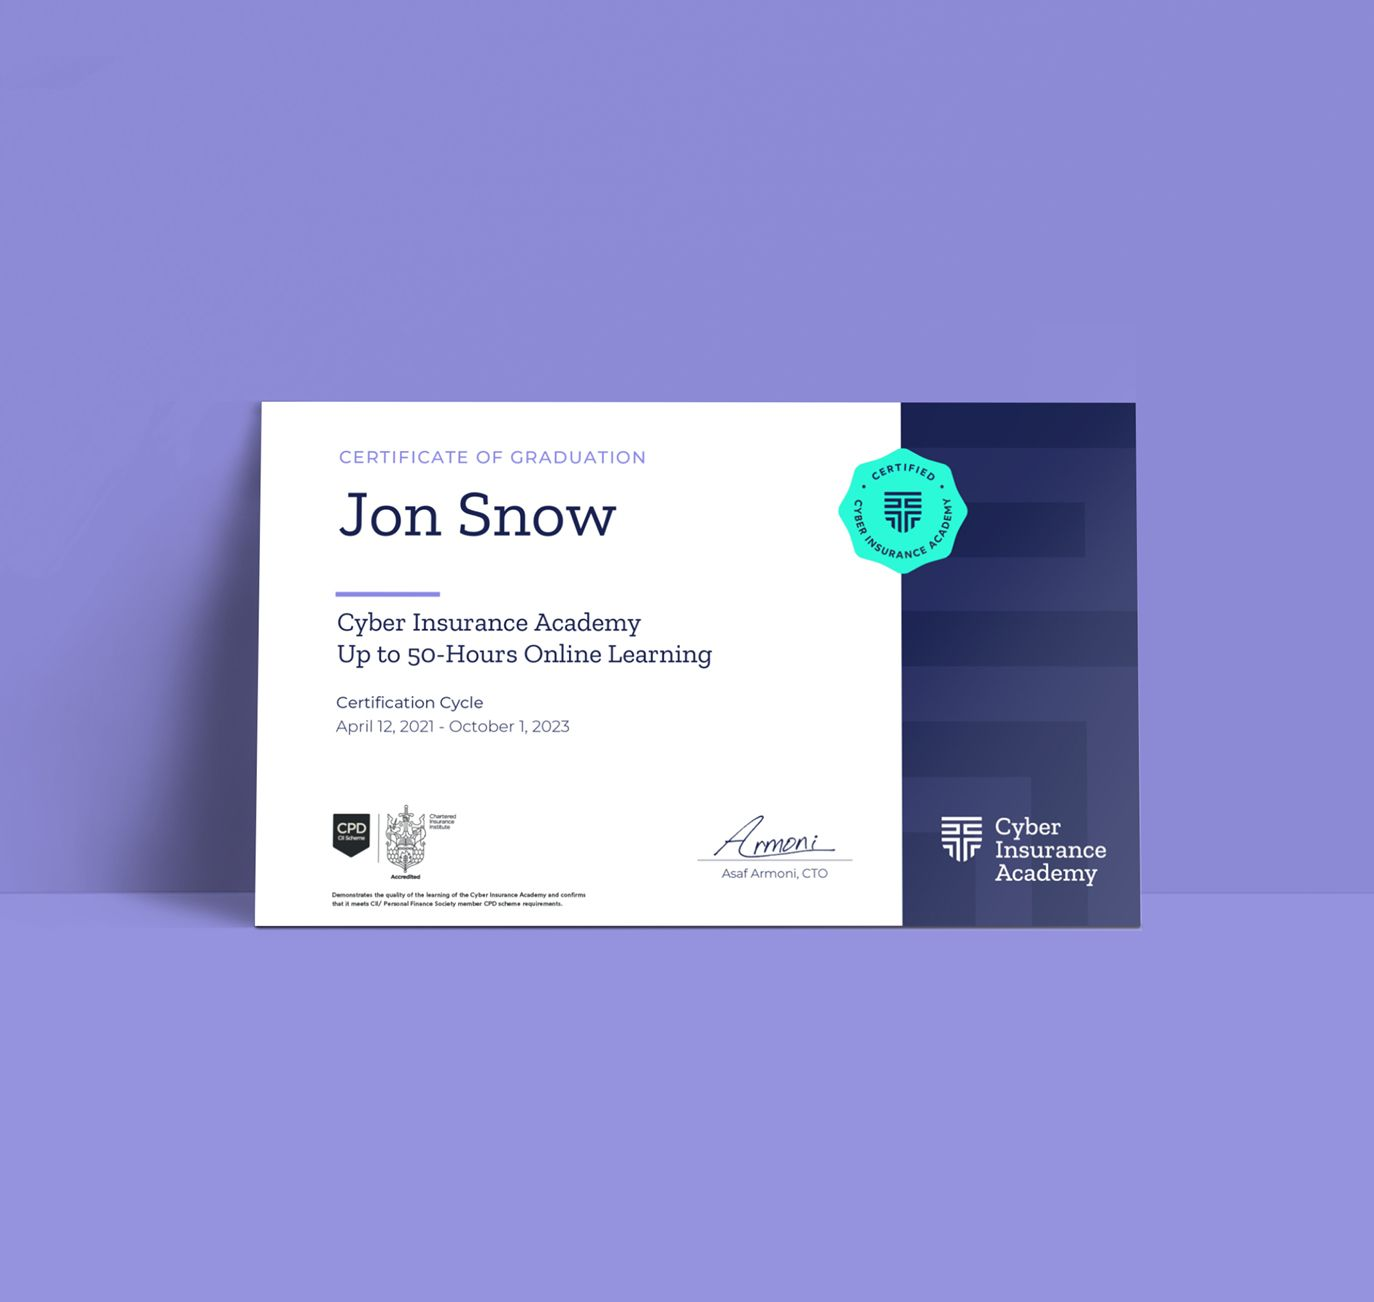 Cyber Insurance Academy certificate